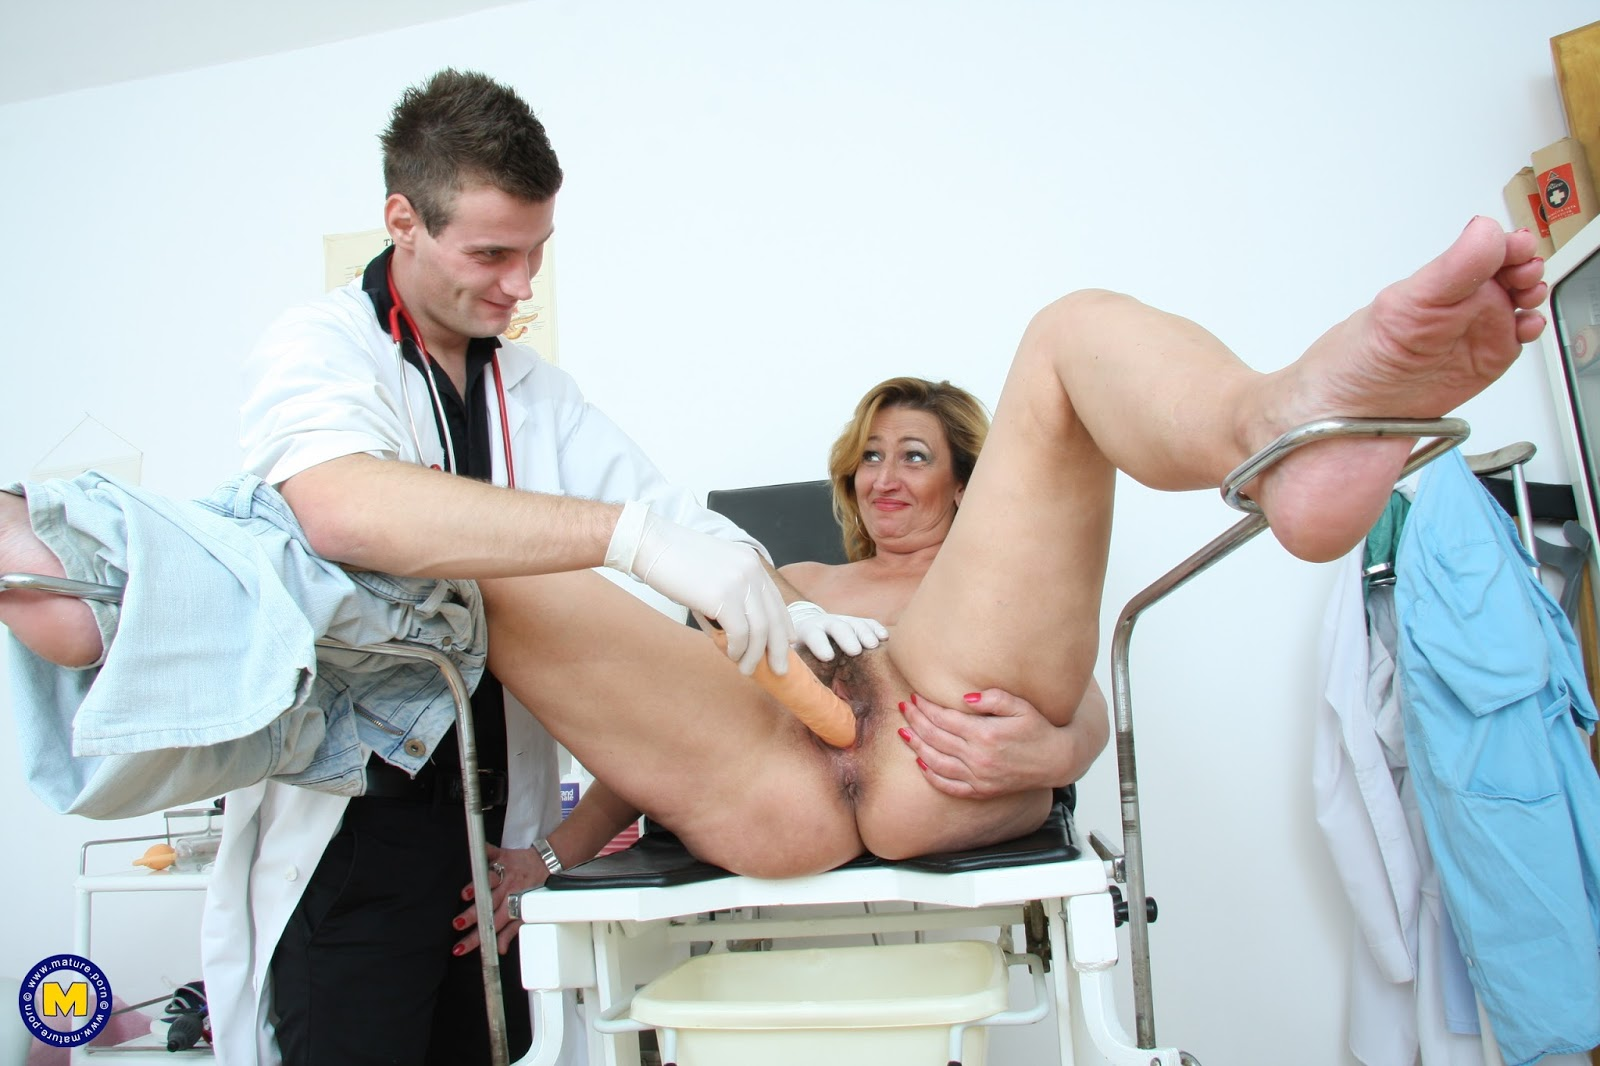 У гинеколога секс онлайн, Порно у гинеколога онлайн, бесплатно секс видео на 22 фотография